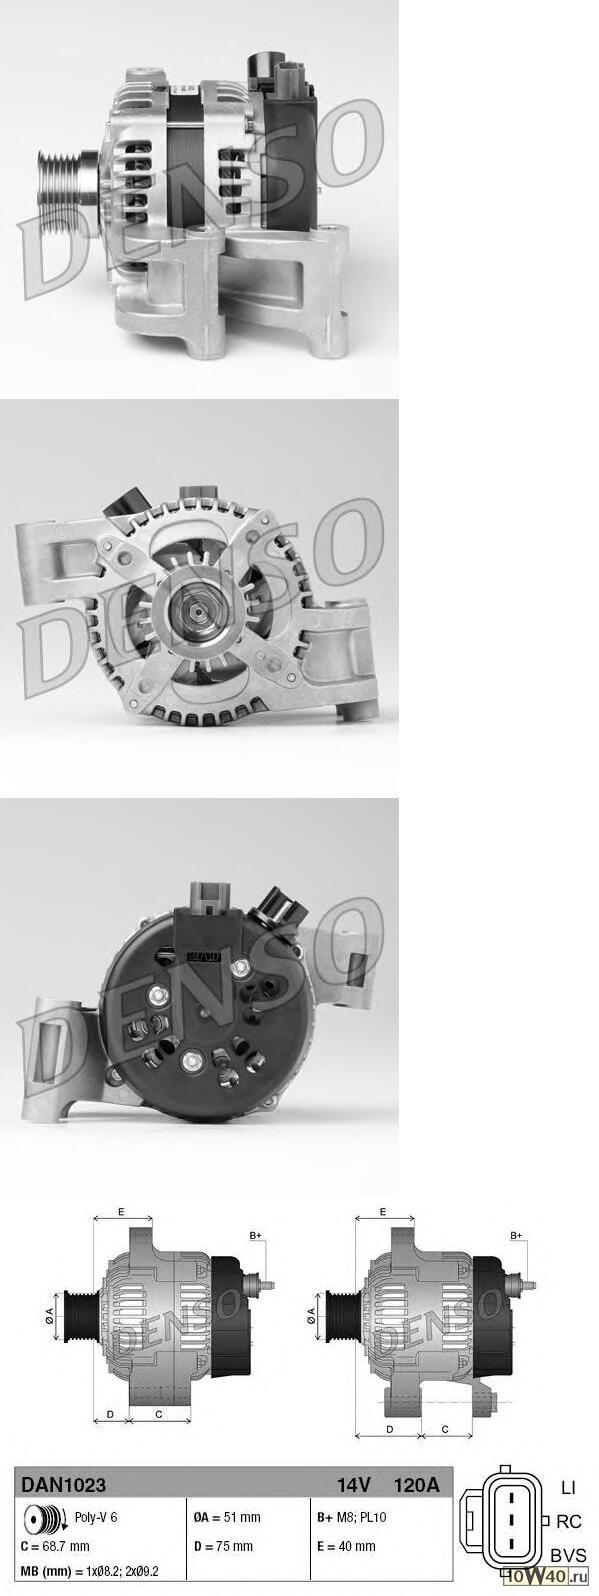 генератор 14v 120a ford c-max 07- 1.8, 2.0 / focus II 06- 1.8, 2.0, c-max 1.8 03-07